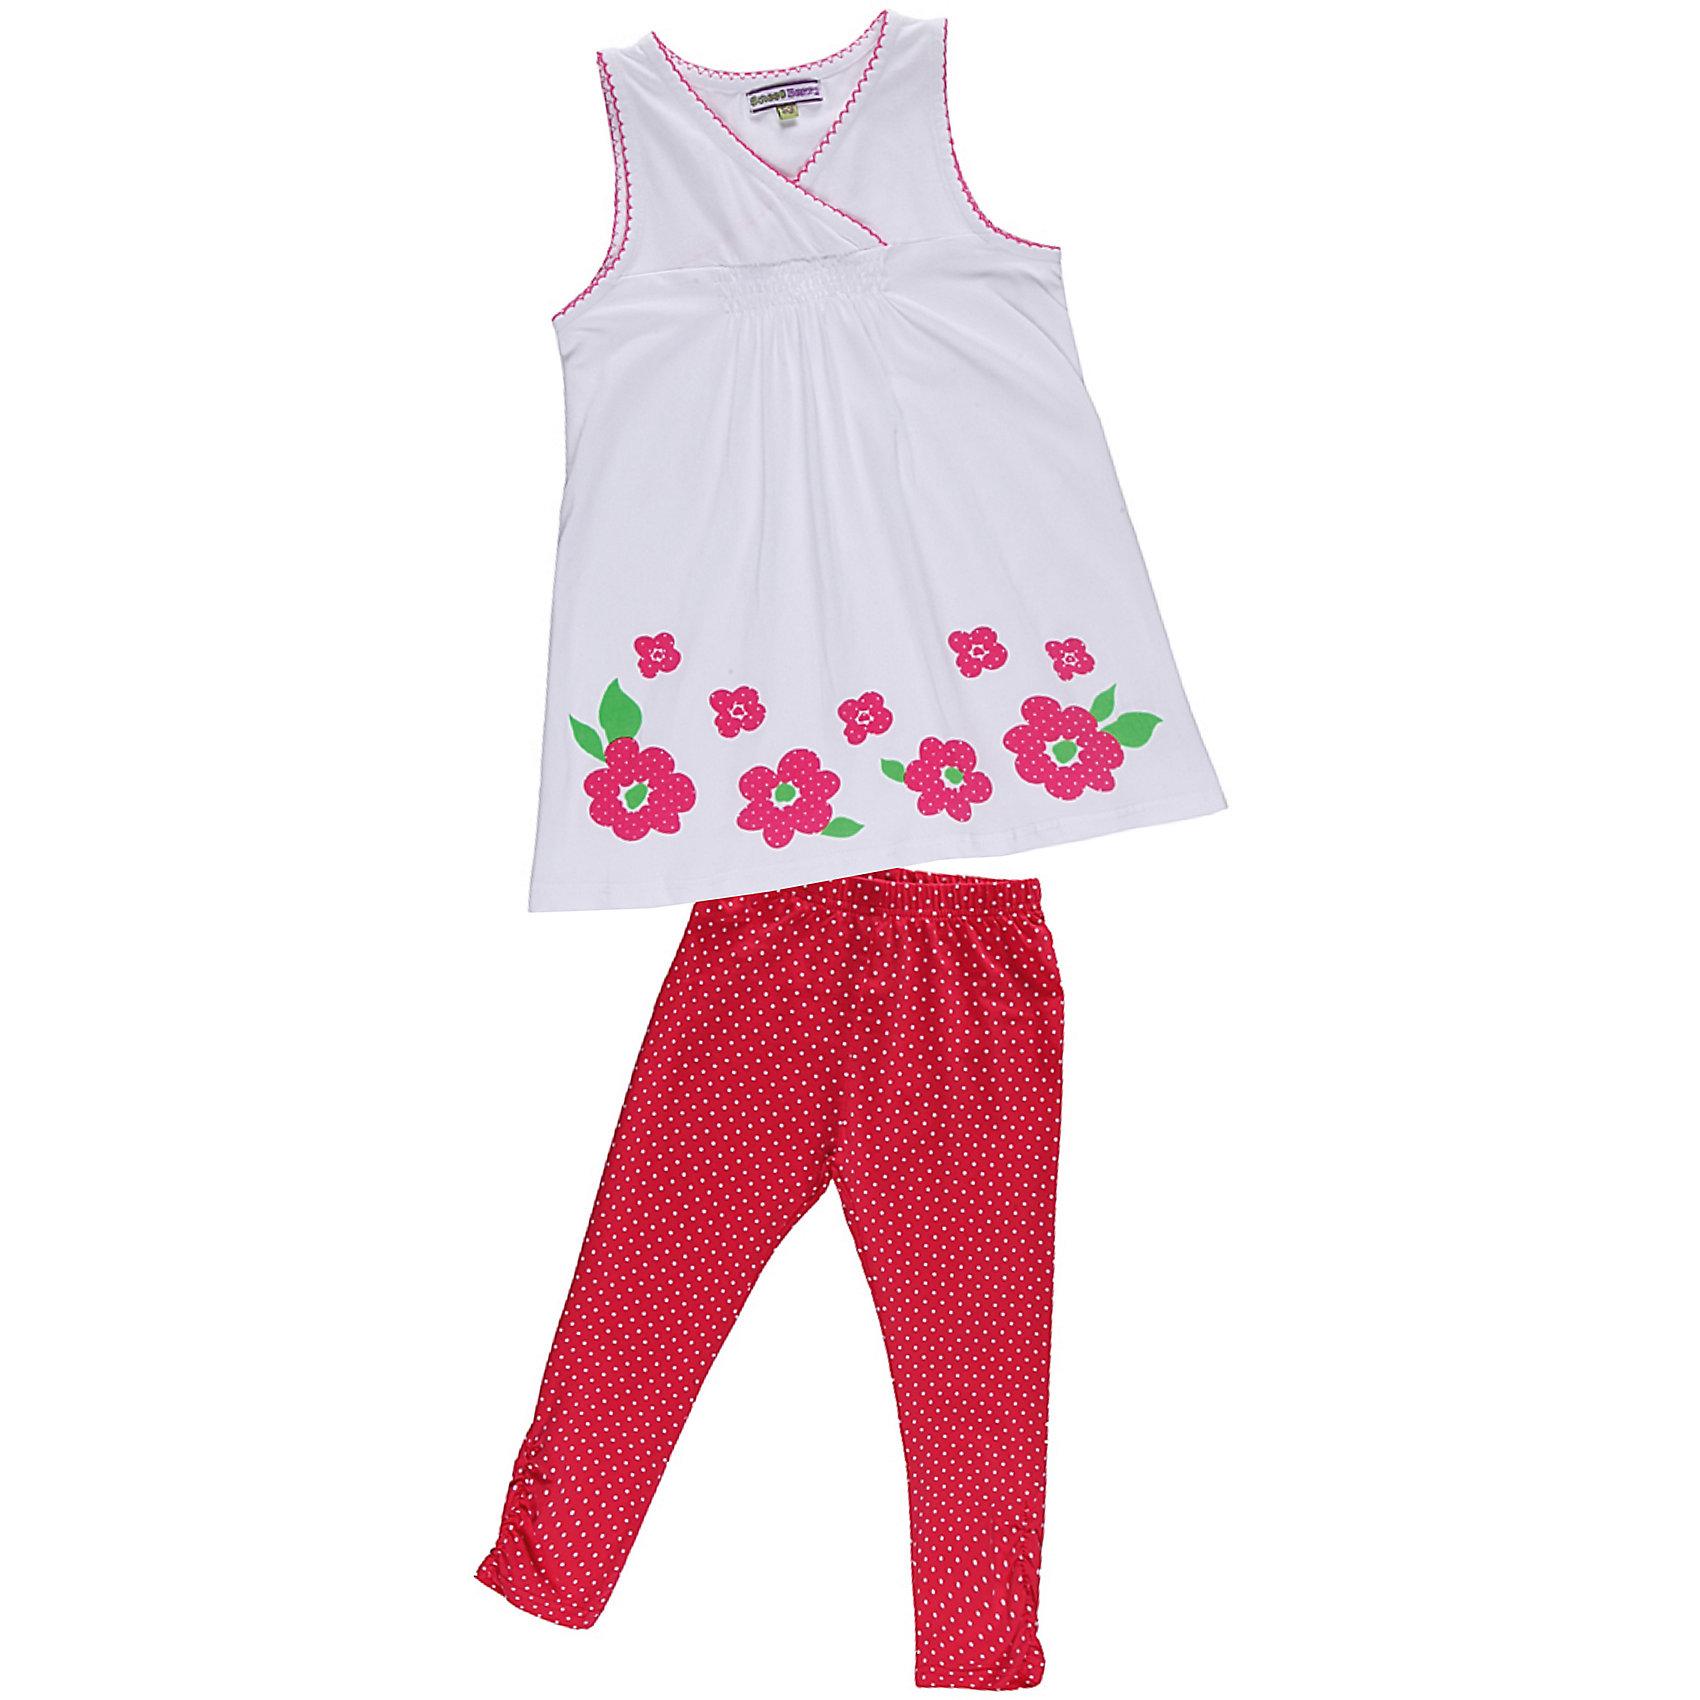 Sweet Berry Комплект для девочки: футболка и леггинсы Sweet Berry sweet berry комплект